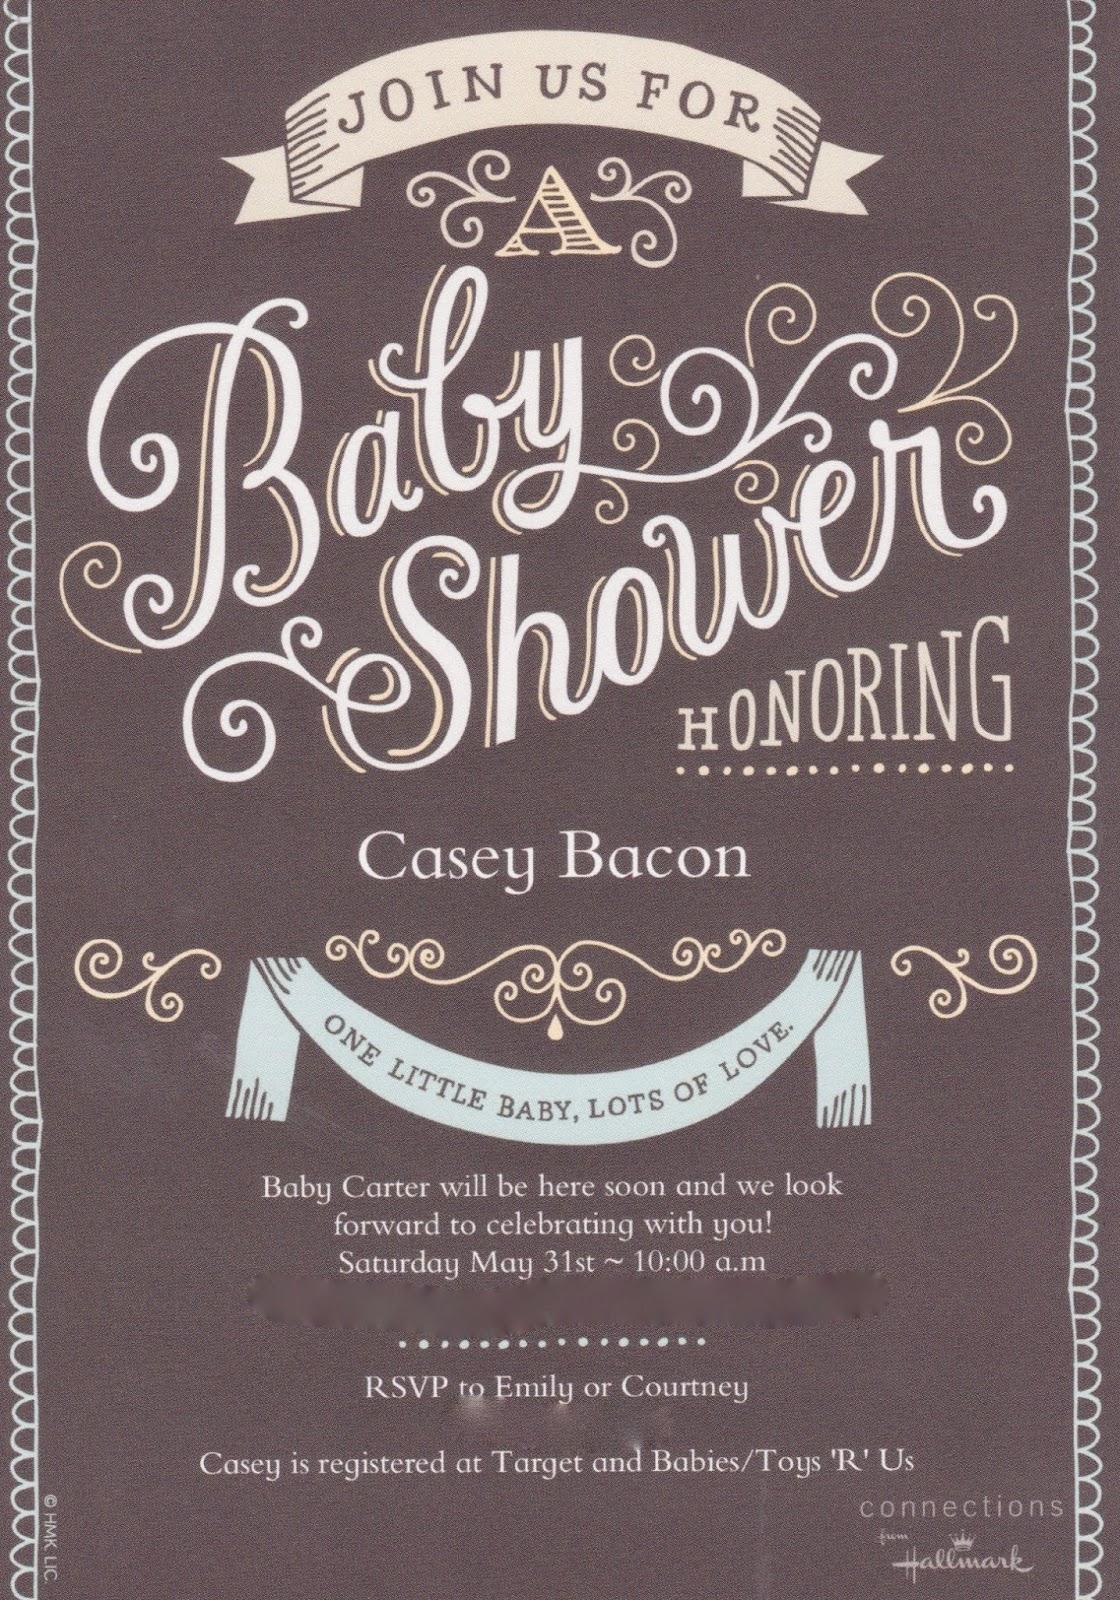 Casey's Baby Shower (Minus Casey)